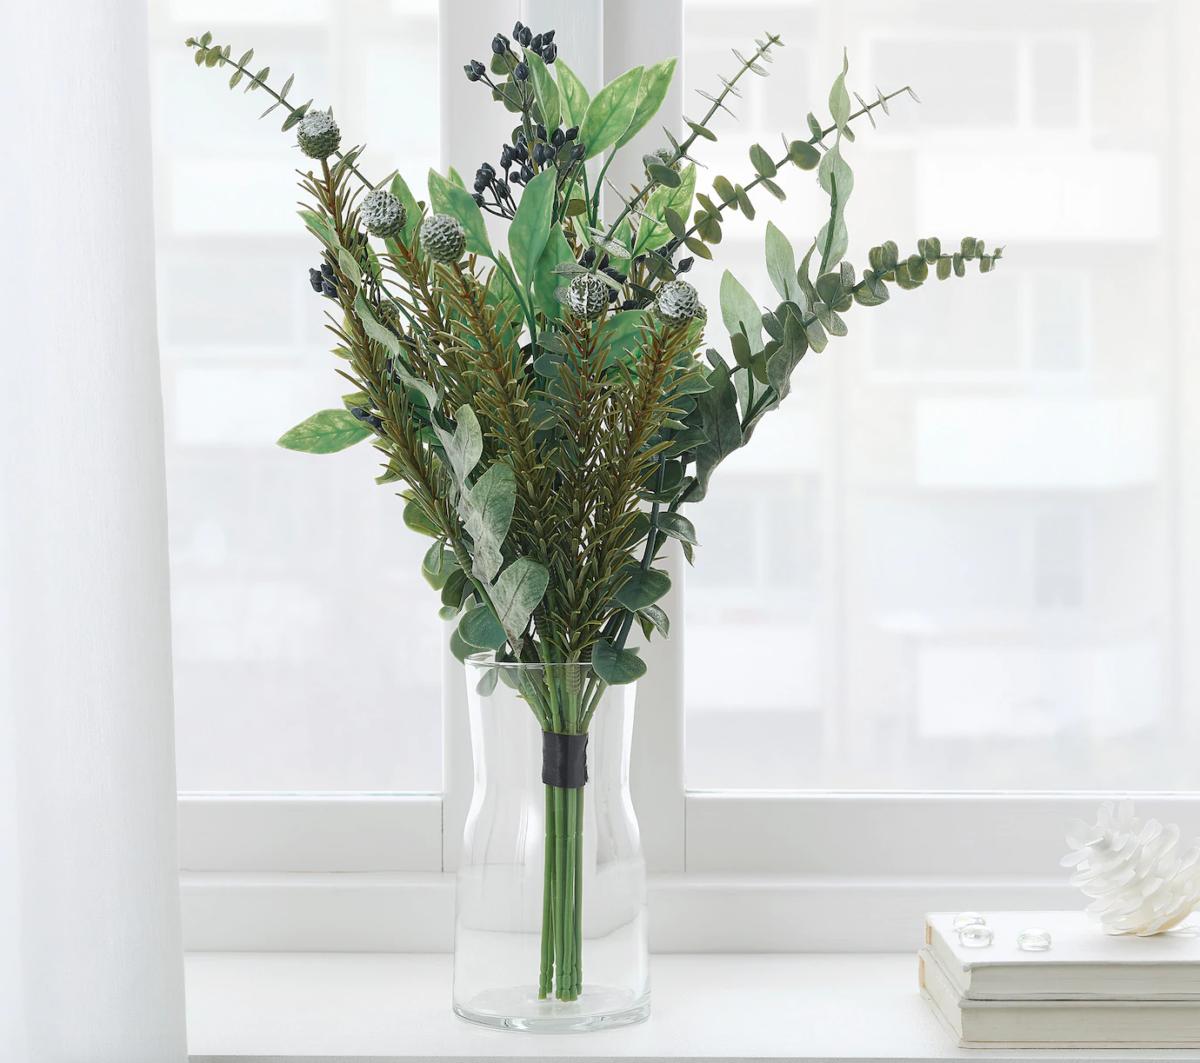 ikea-natale-piante-addobbi